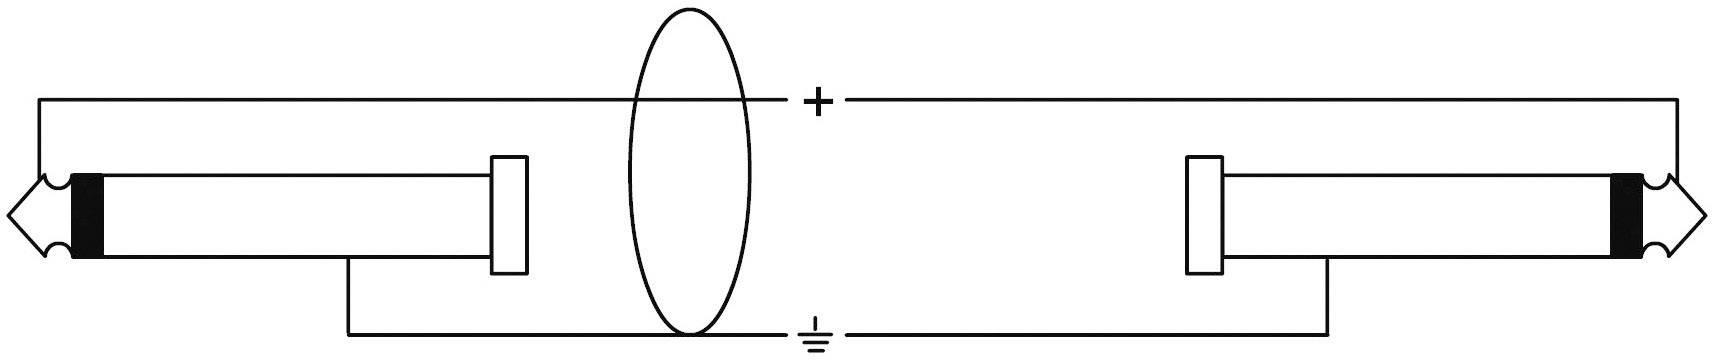 Kabel Cordial CPL 10 PP 25, [1x jack zástrčka 6,3 mm - 1x jack zástrčka 6,3 mm], 10 m, černá